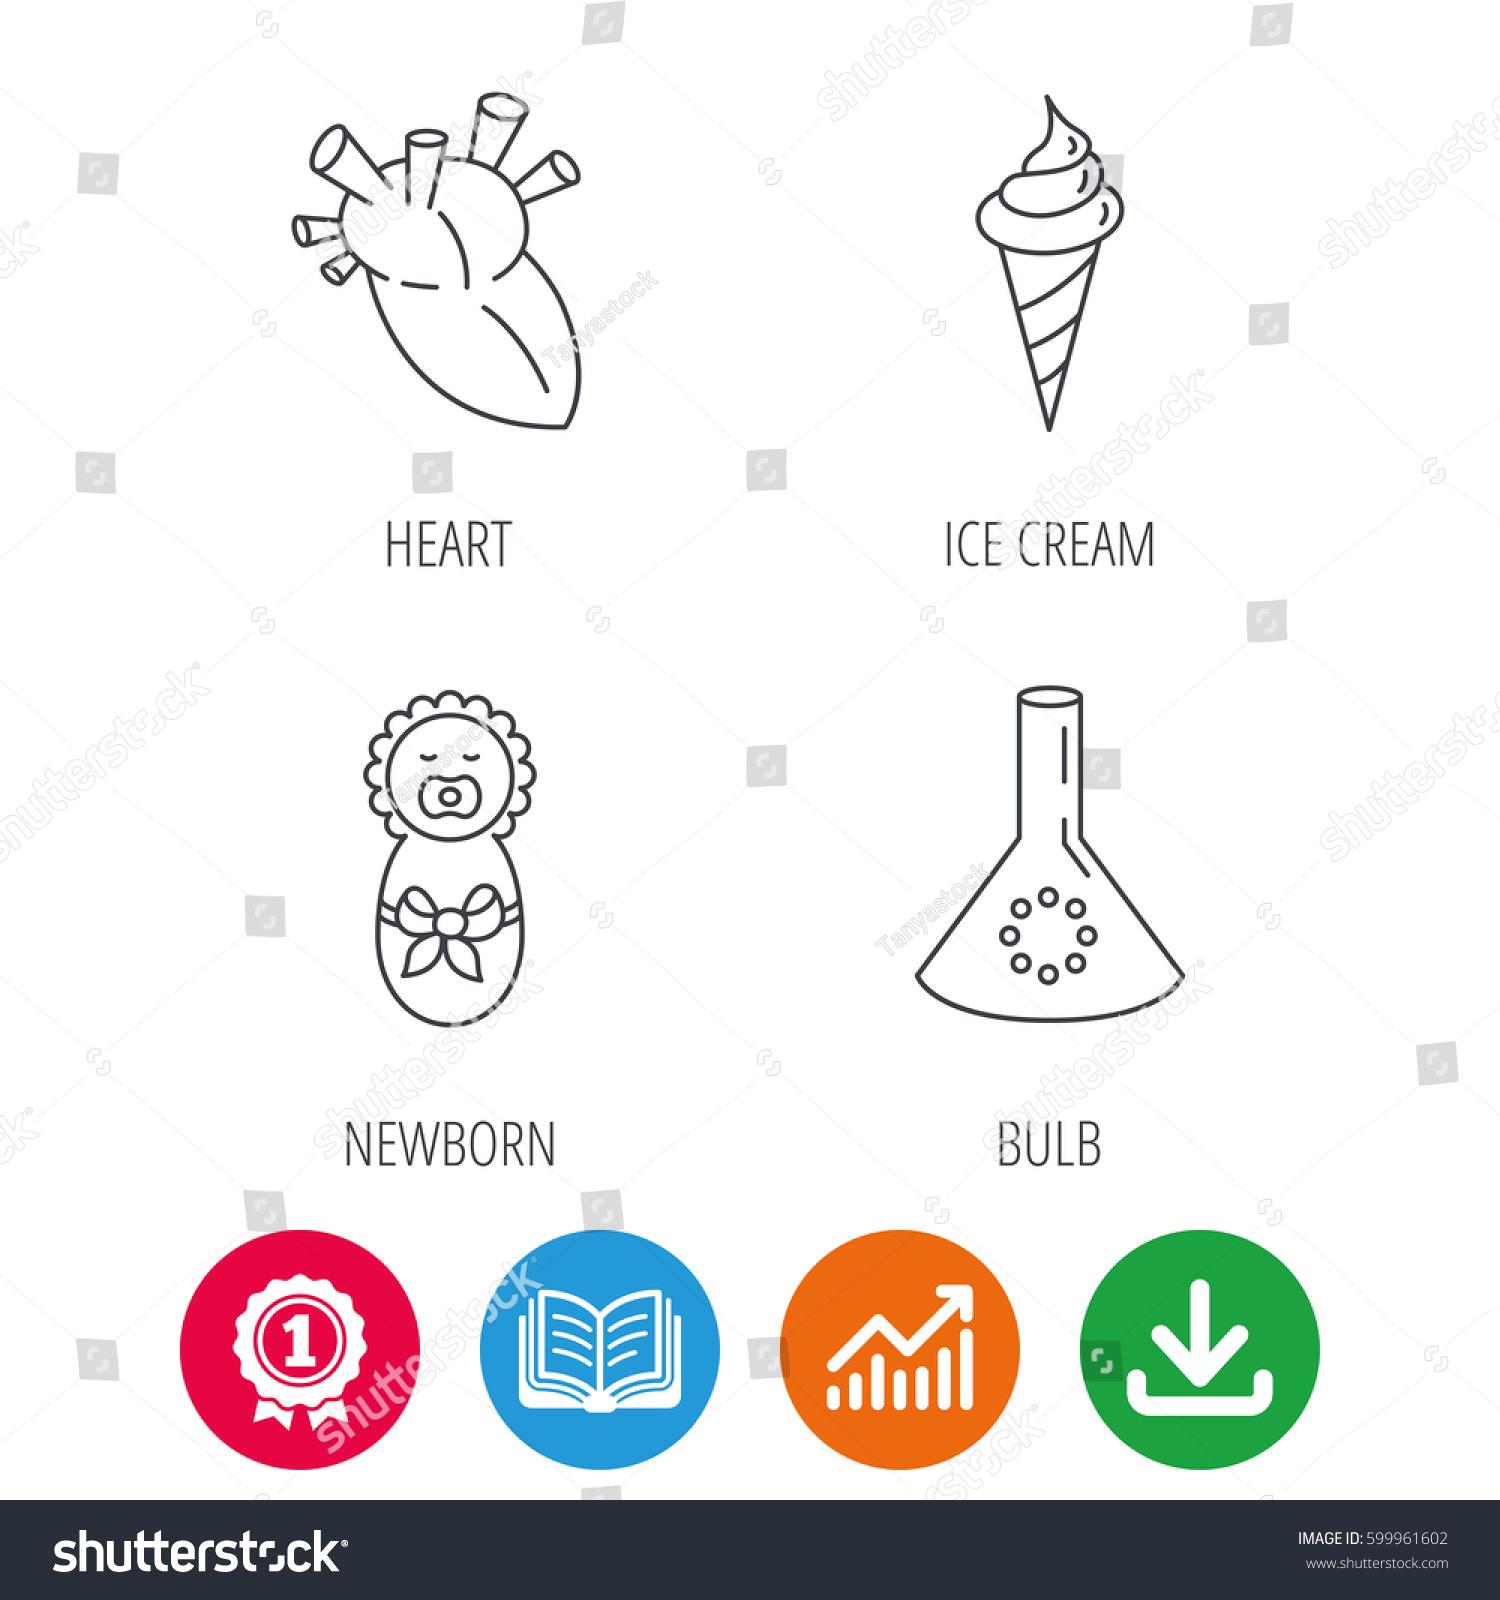 Newborn Heart Lab Bulb Icons Ice Stock Vector Royalty Free